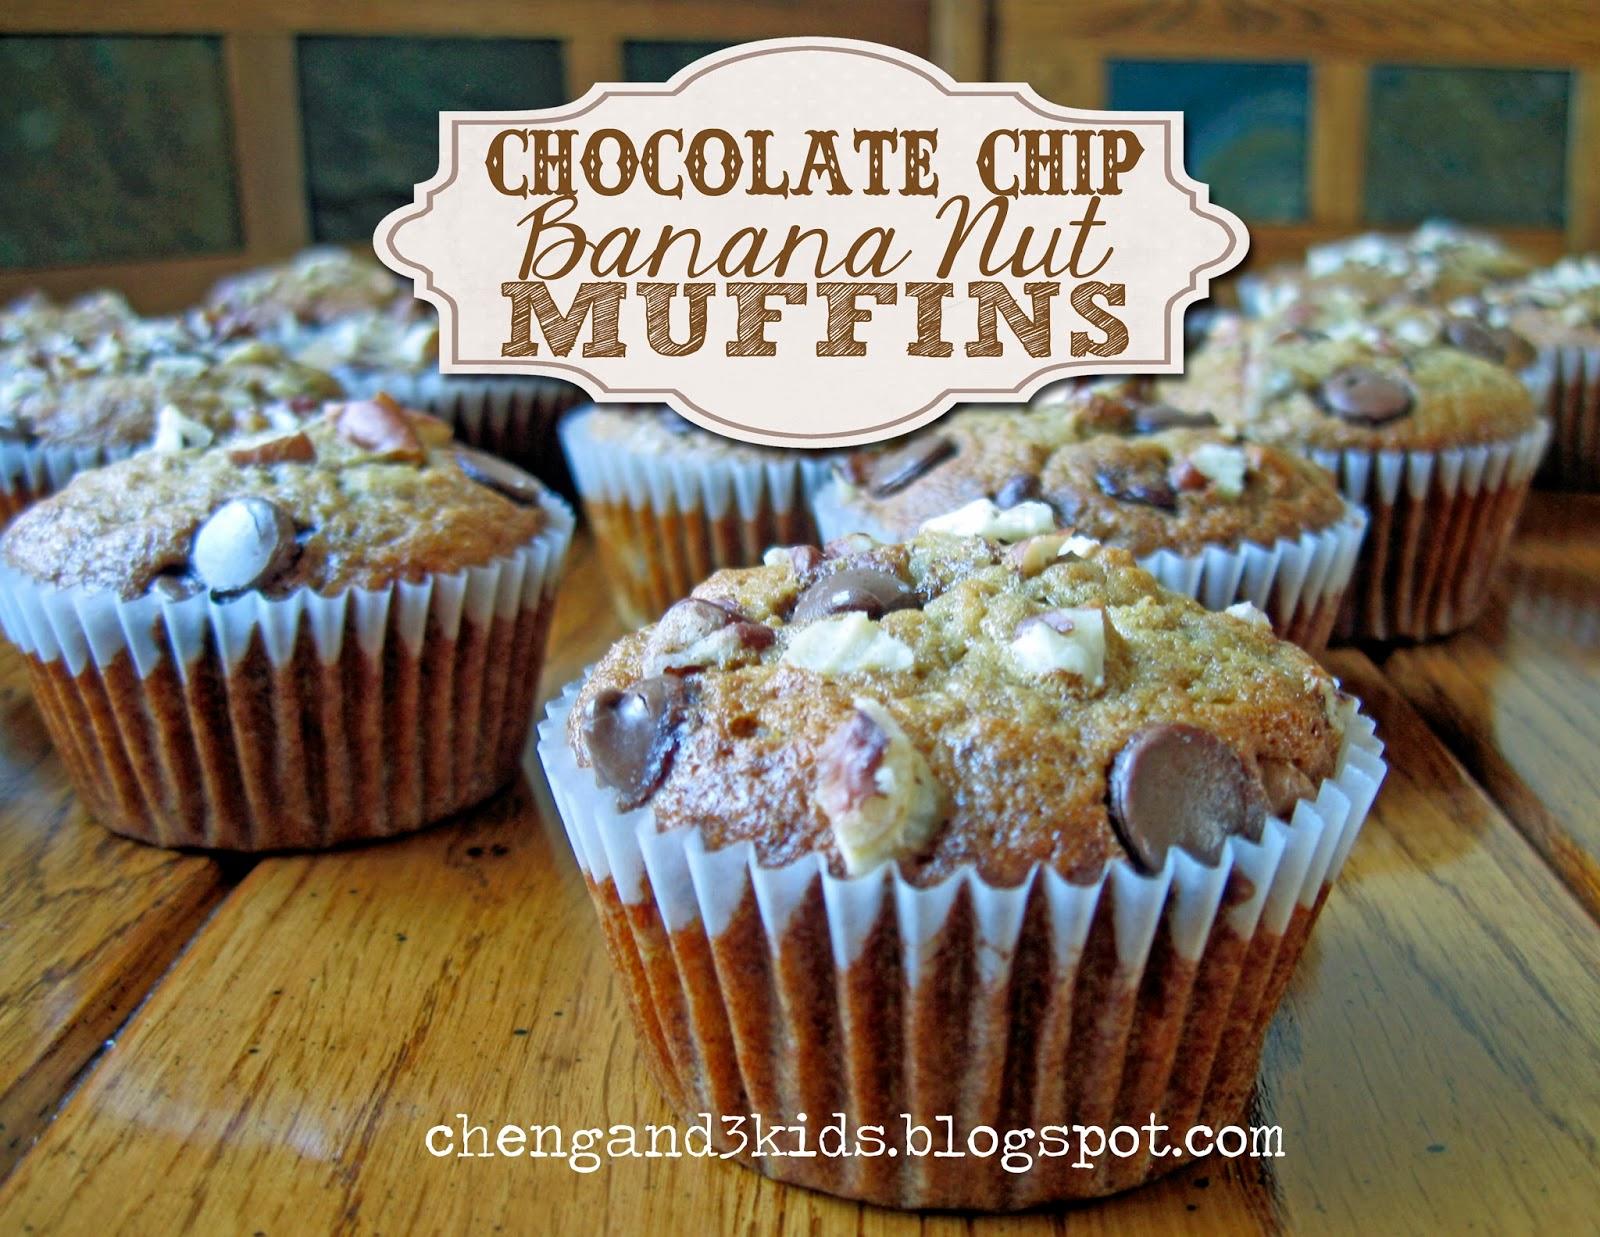 Cheng And 3 Kids Chocolate Chip Banana Nut Muffins